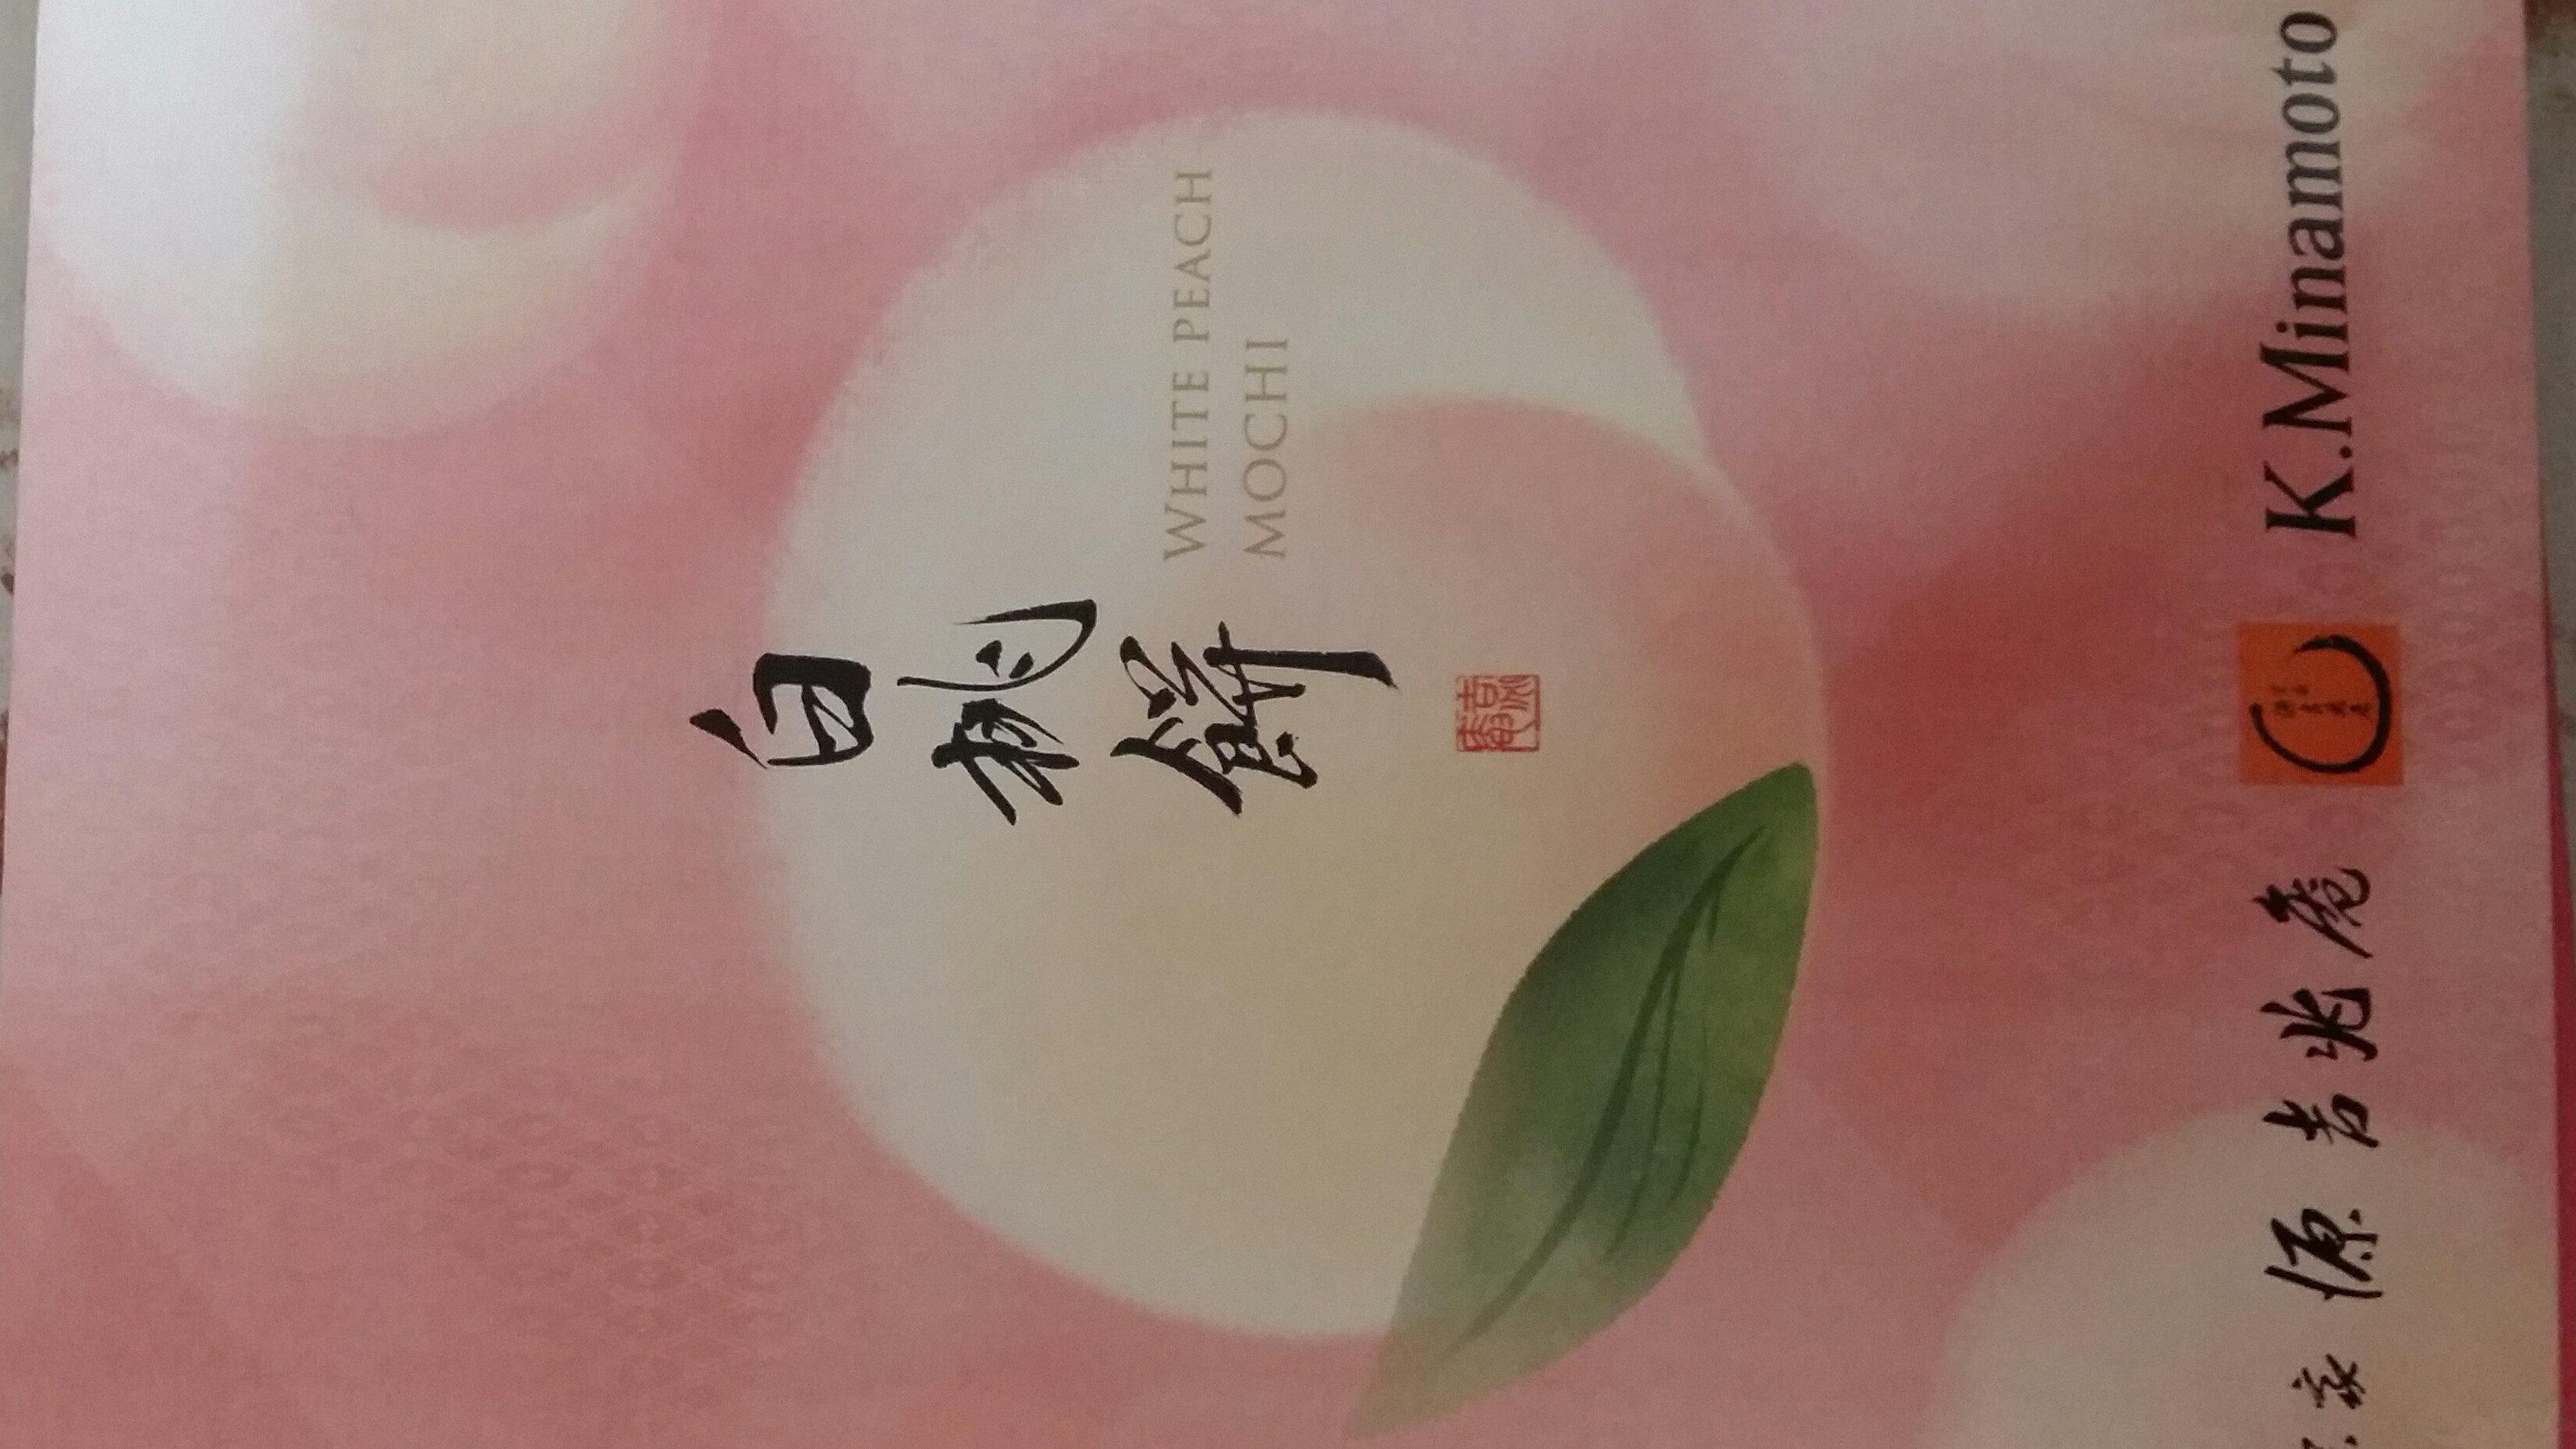 White peach mochi - Product - en